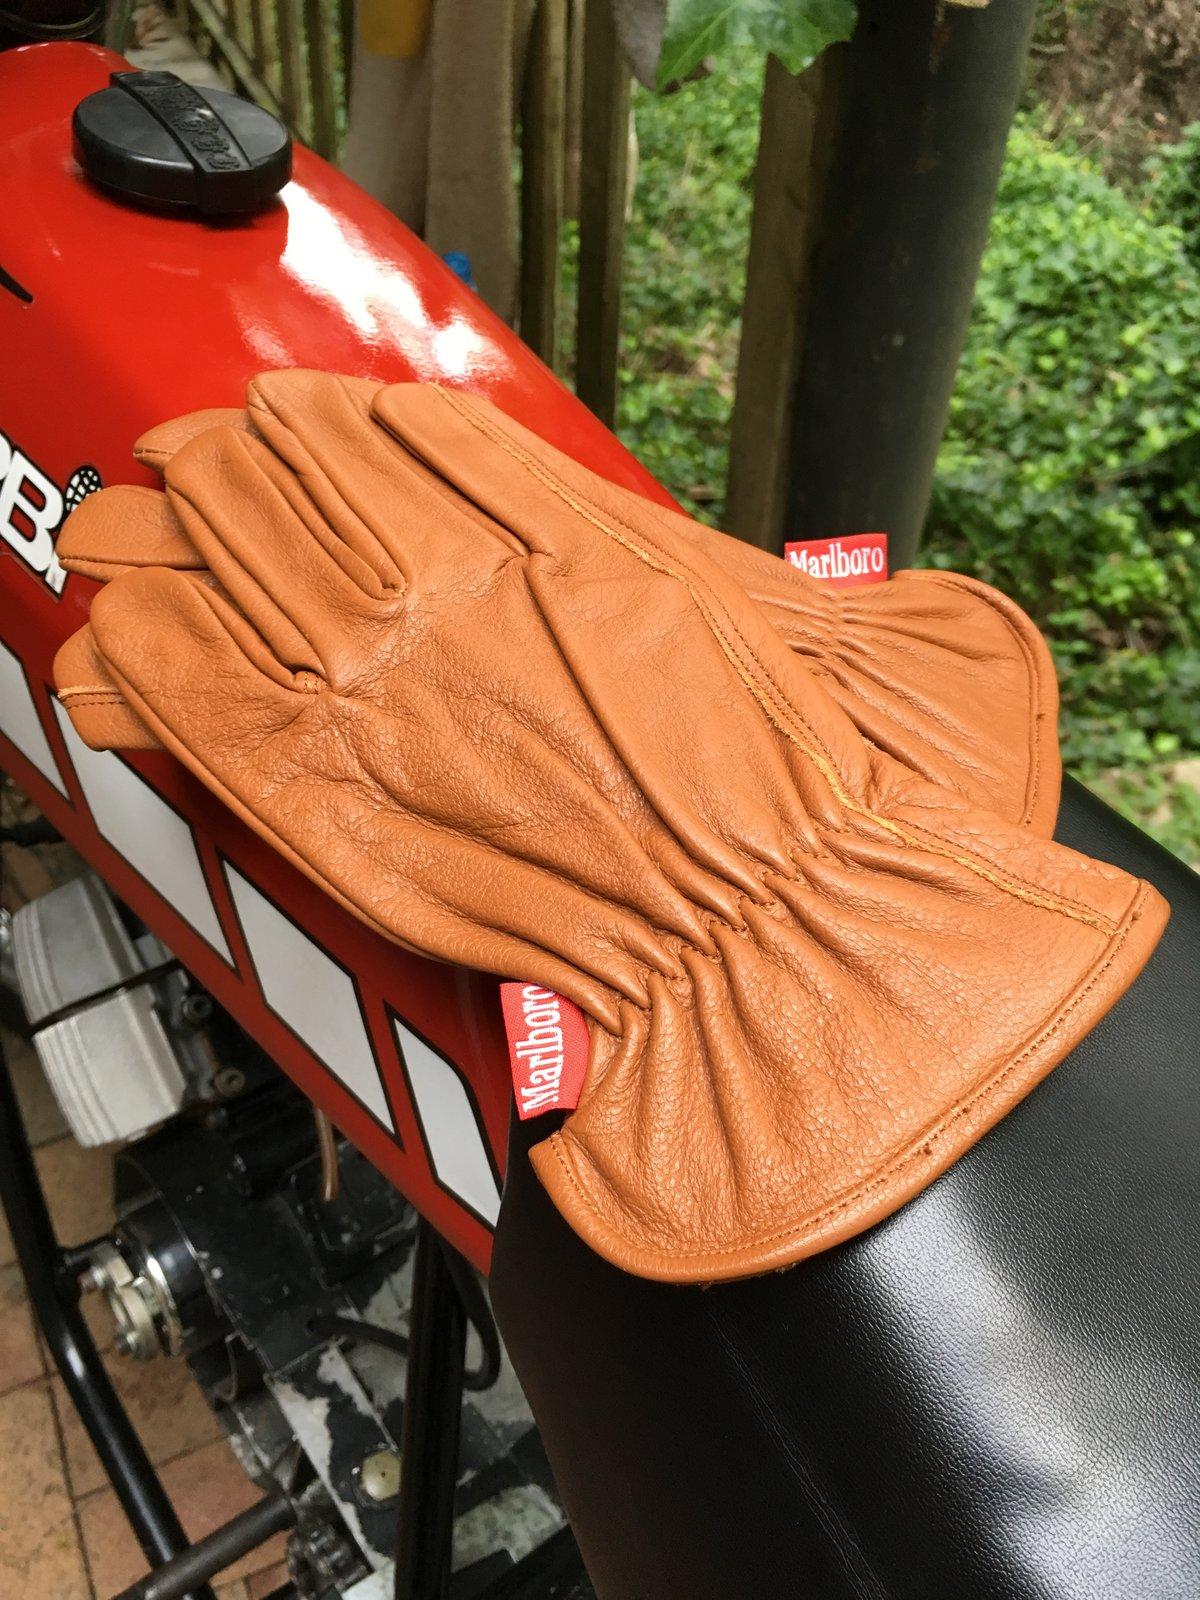 Image of Marlboro Genuine Leather Gloves